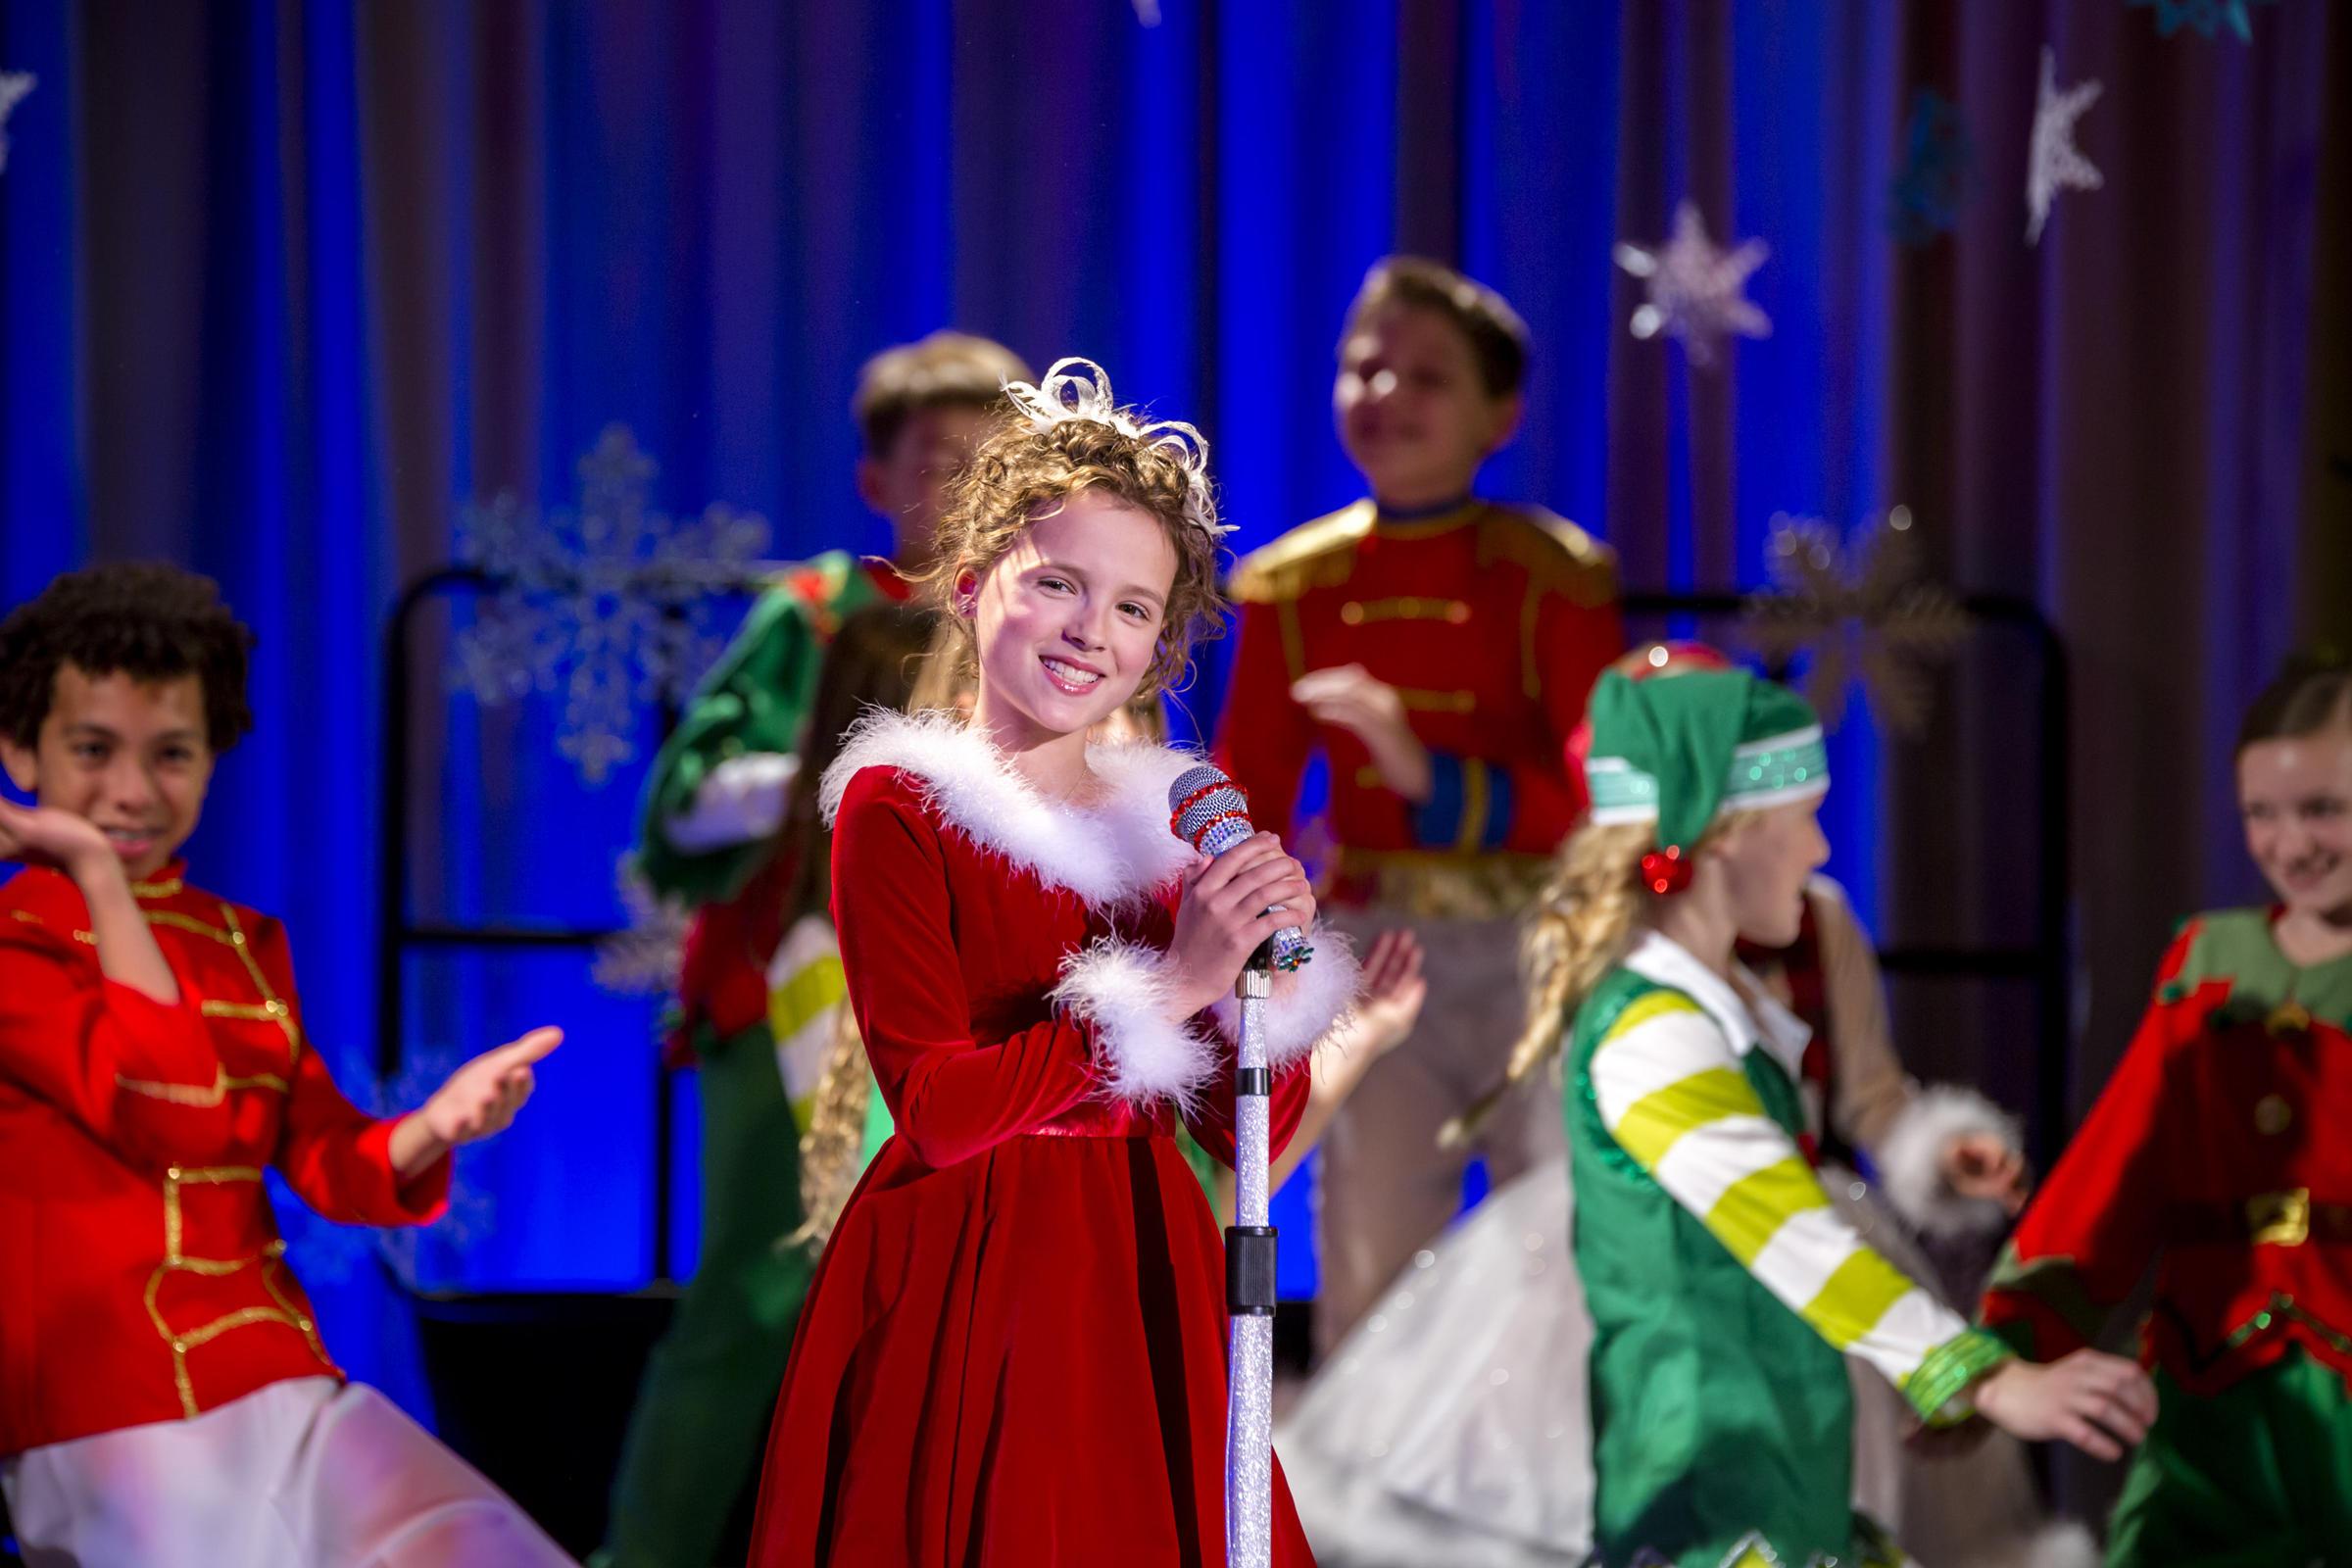 broadway star fina strazza singing oh santa on the kilgour elementary school stage in october - Hallmark Christmas 2015